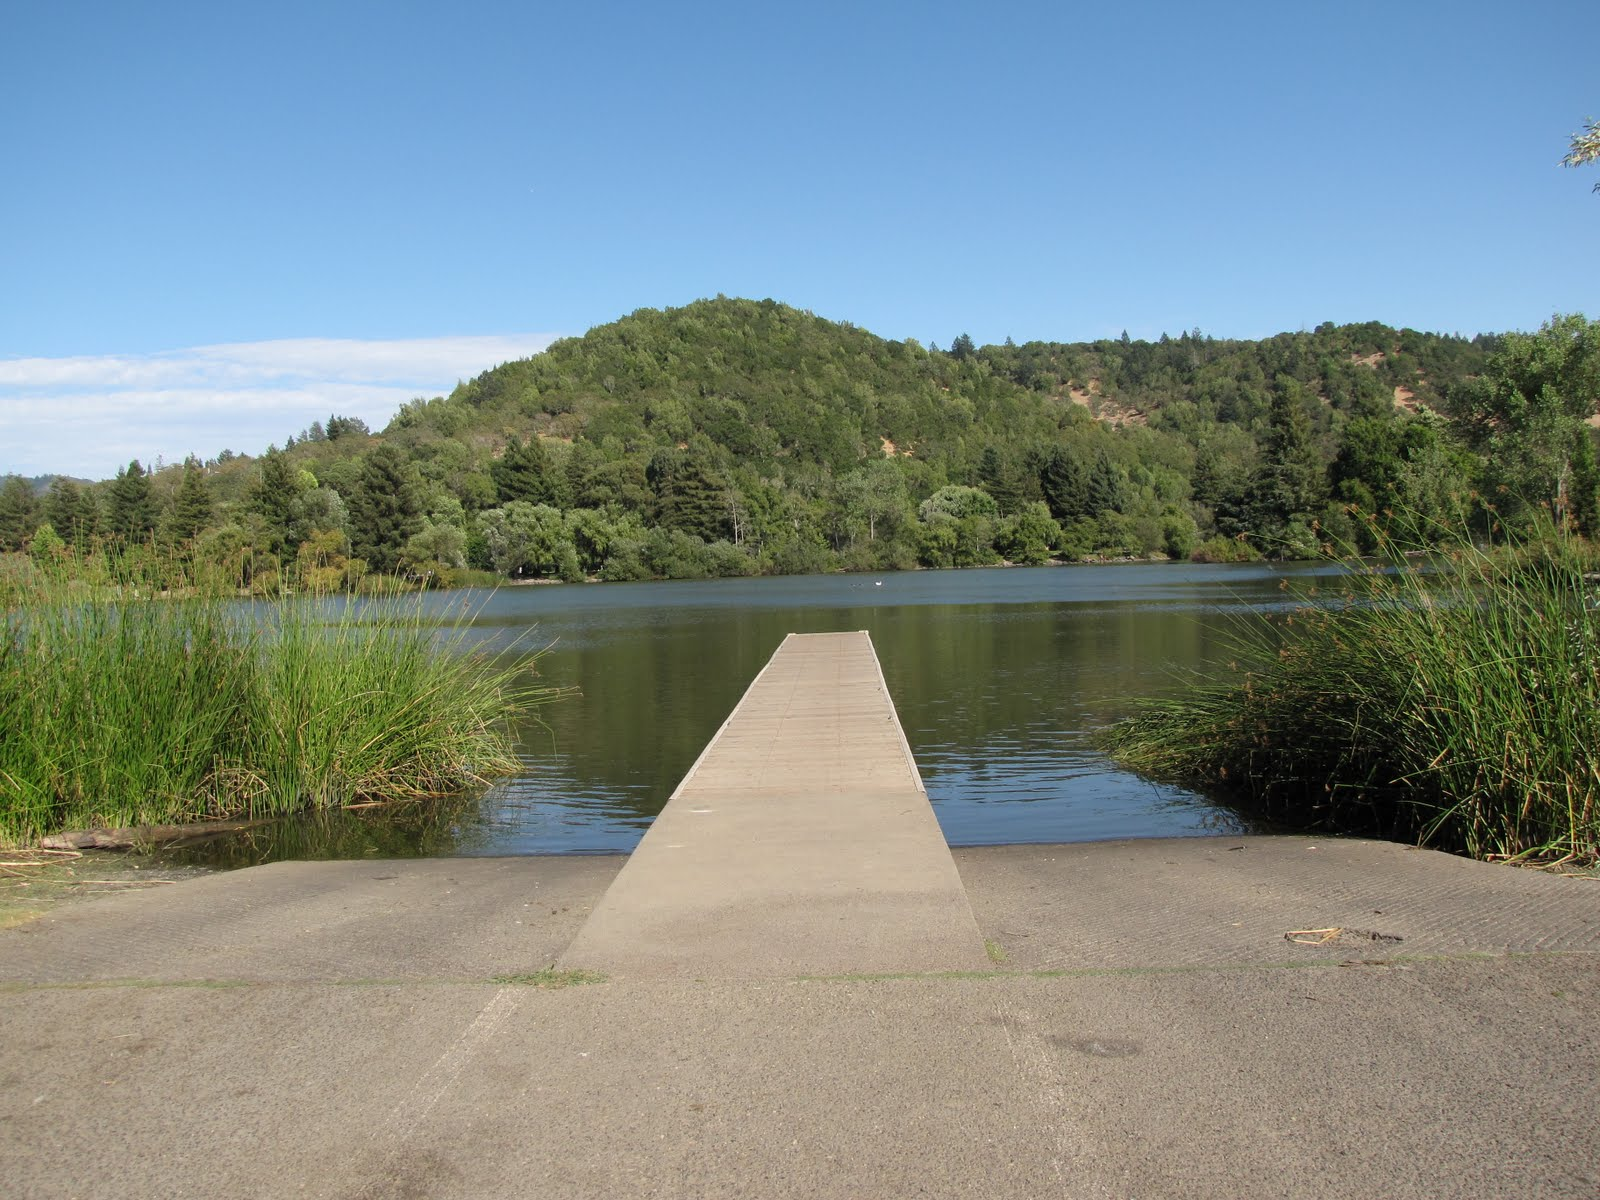 Sonoma county hike bike and bean blog spring lake for Lake sonoma fishing report